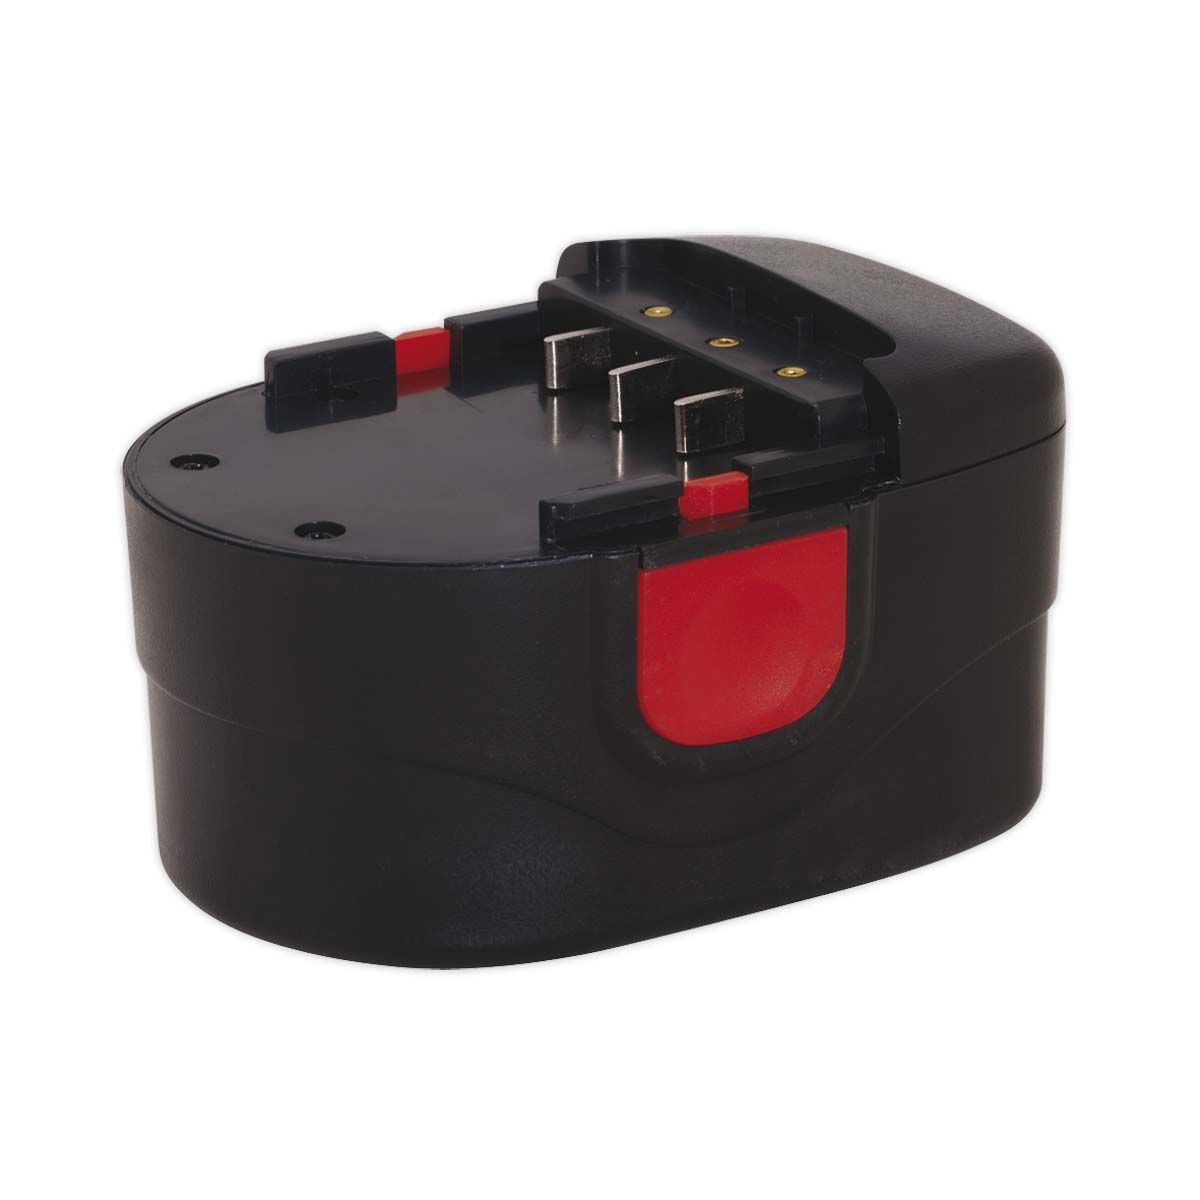 Sealey Power Tool Battery 12V 1.7Ah Ni-MH for CPG12V